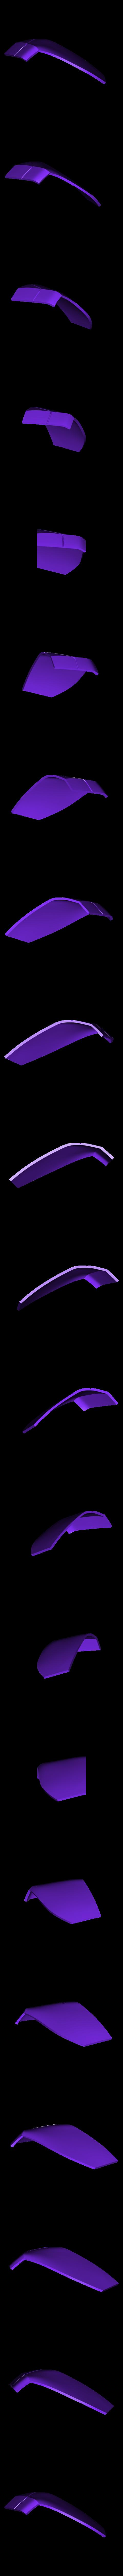 Part_8_v2.stl Download free STL file Red Hood Helmet (Batman) with Details • Template to 3D print, VillainousPropShop